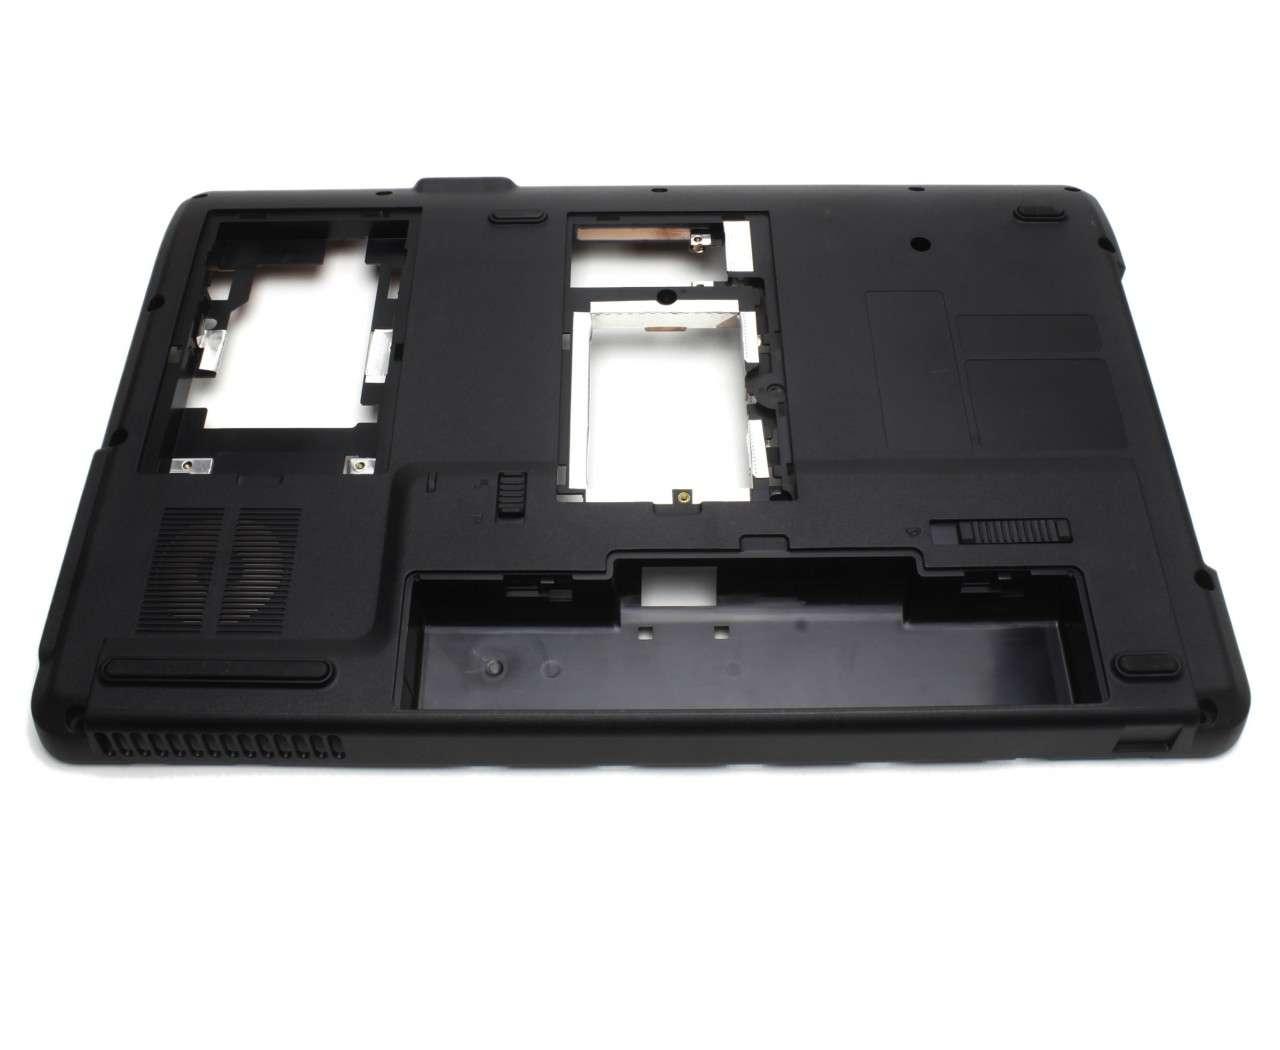 Bottom Case Emachines E725 Carcasa Inferioara Neagra imagine powerlaptop.ro 2021